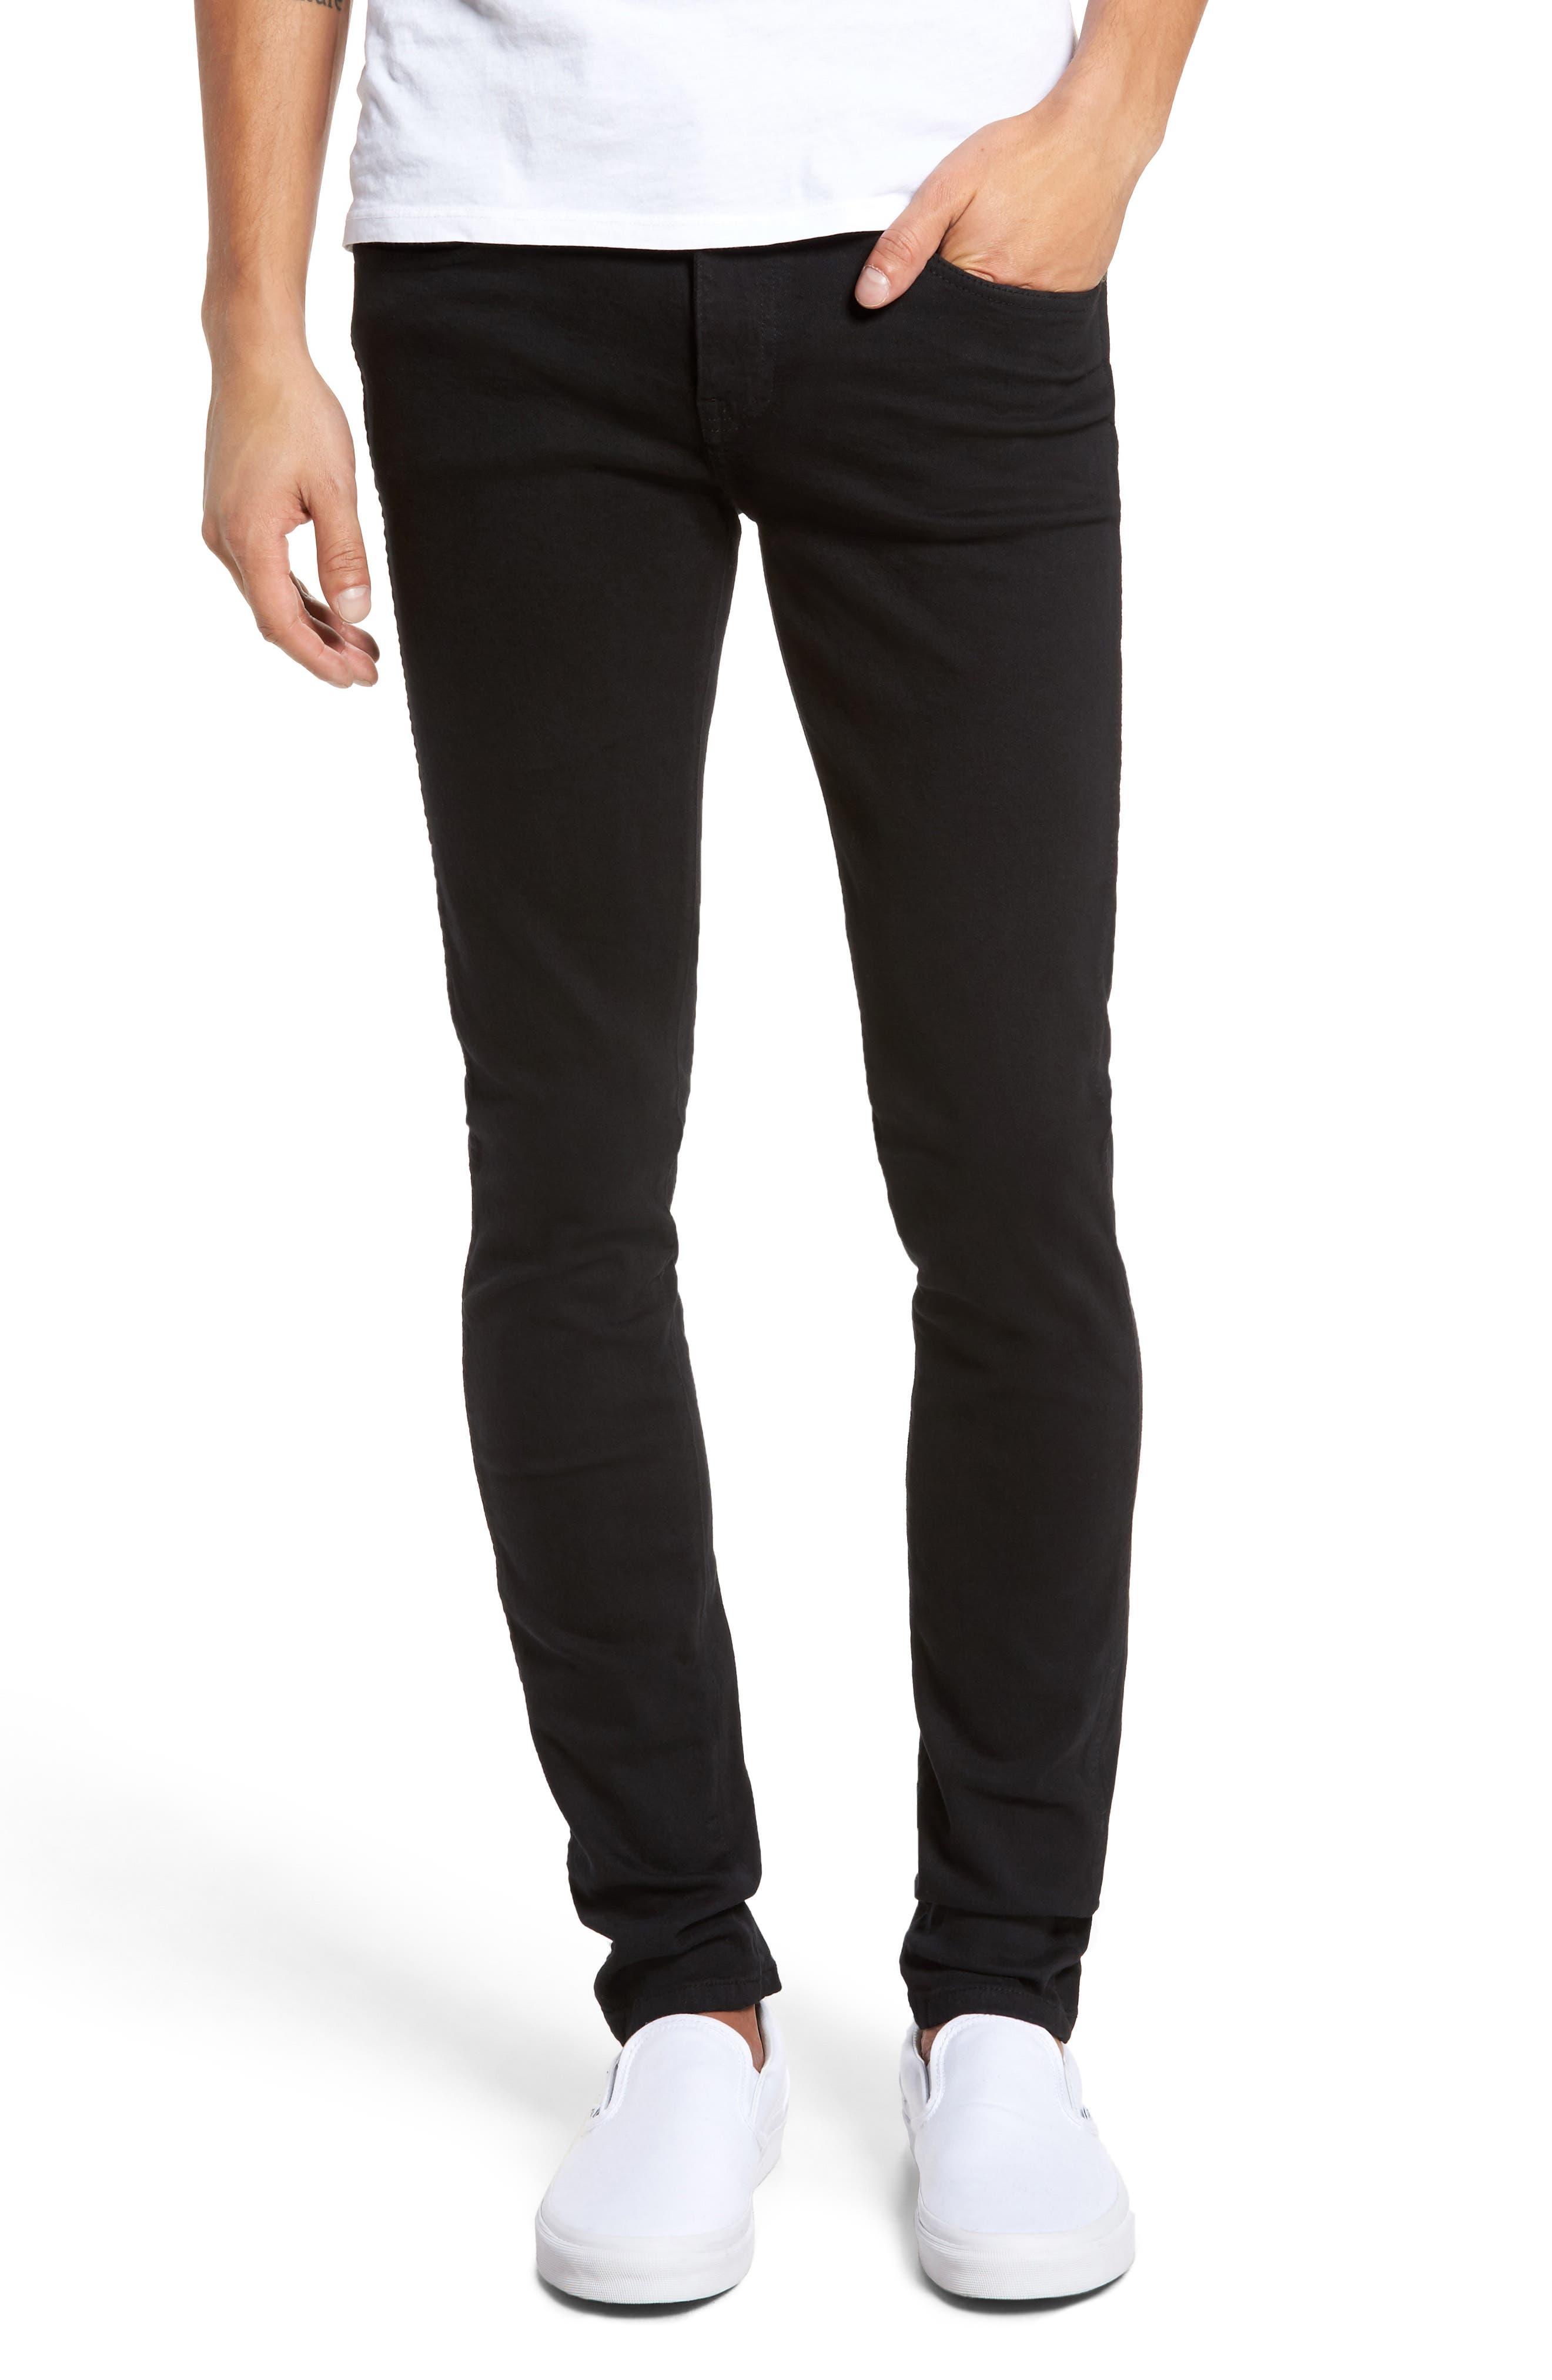 Snap Skinny Fit Jeans,                         Main,                         color, Black